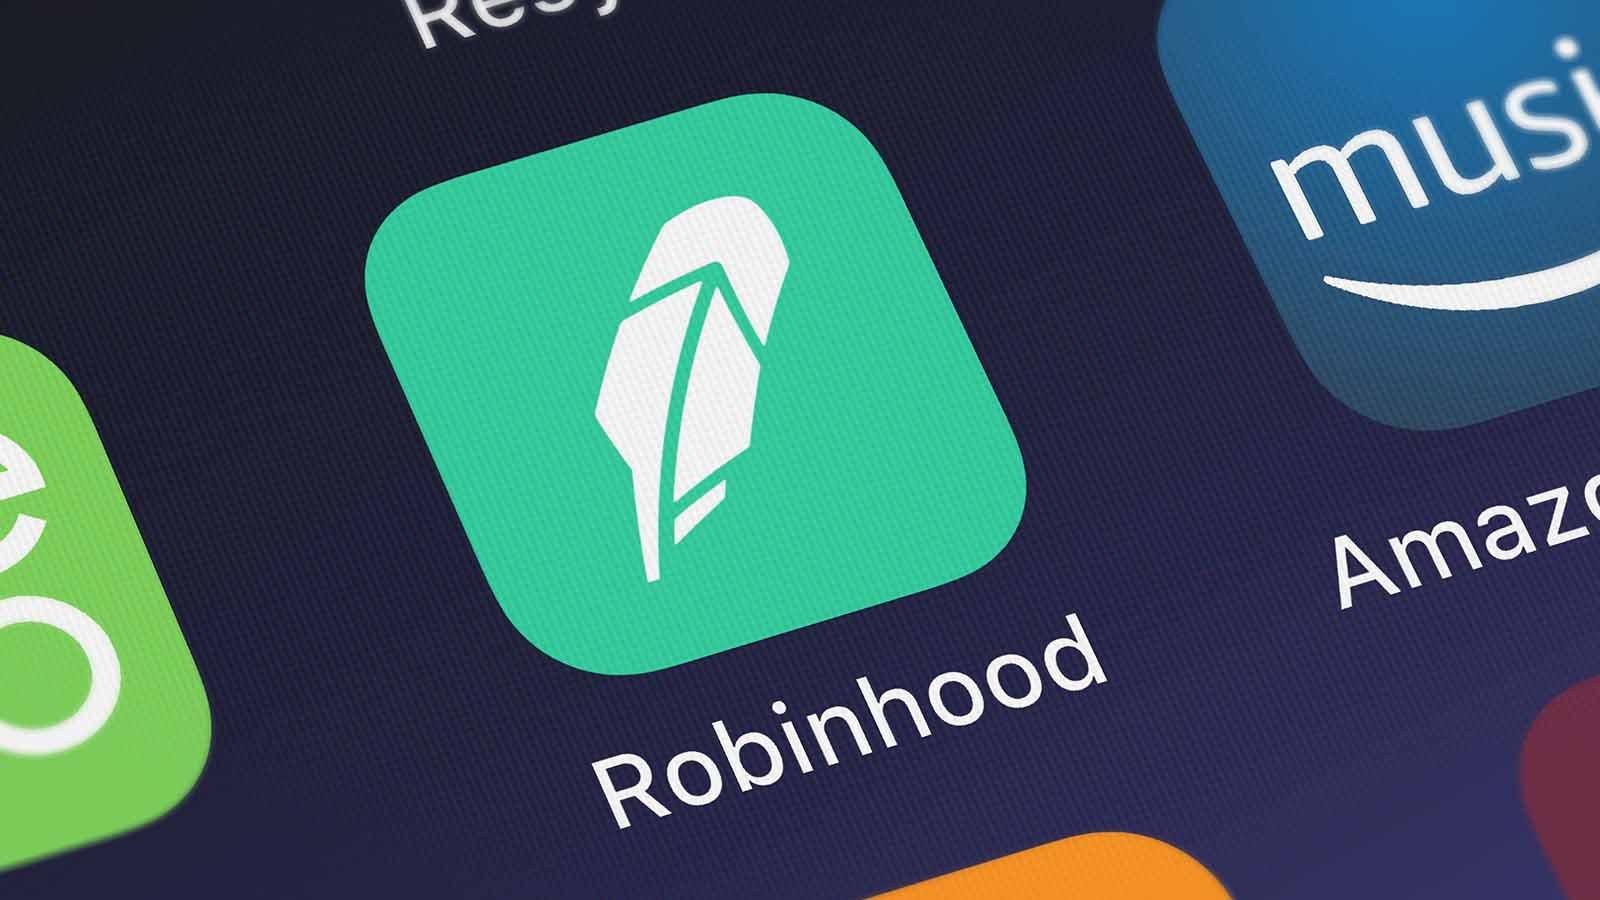 robinhood and reddit